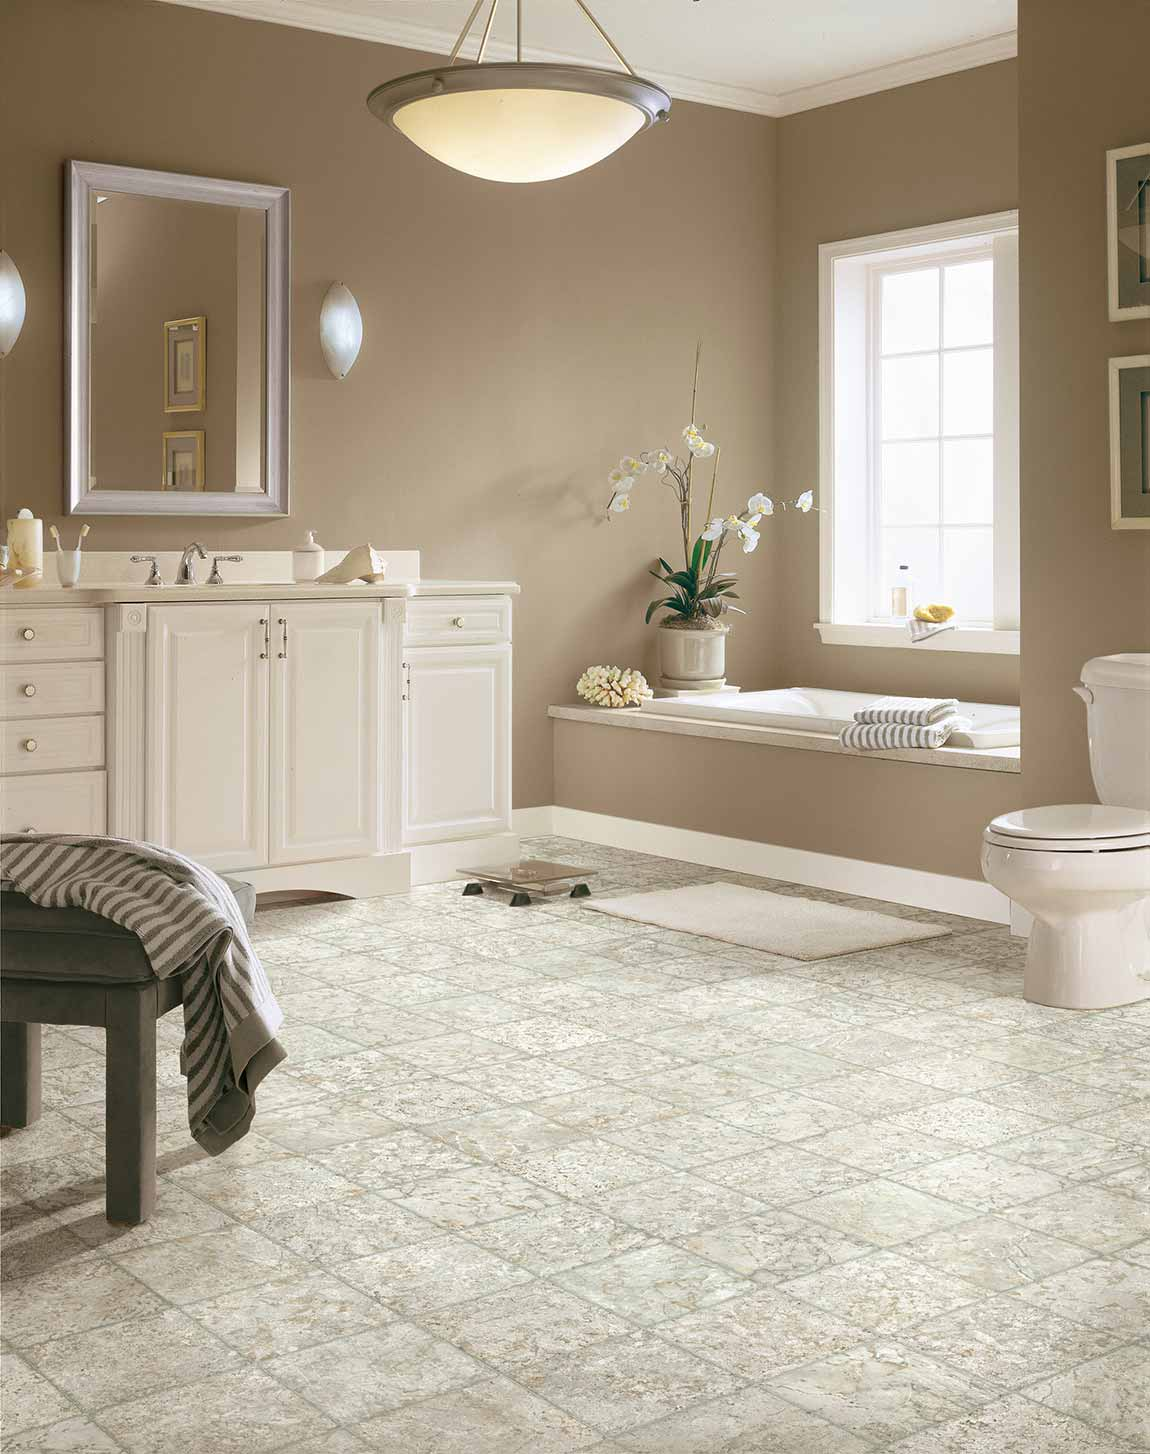 Tile Coastal Beach House Bathroom Flooring Designs | Flooring America